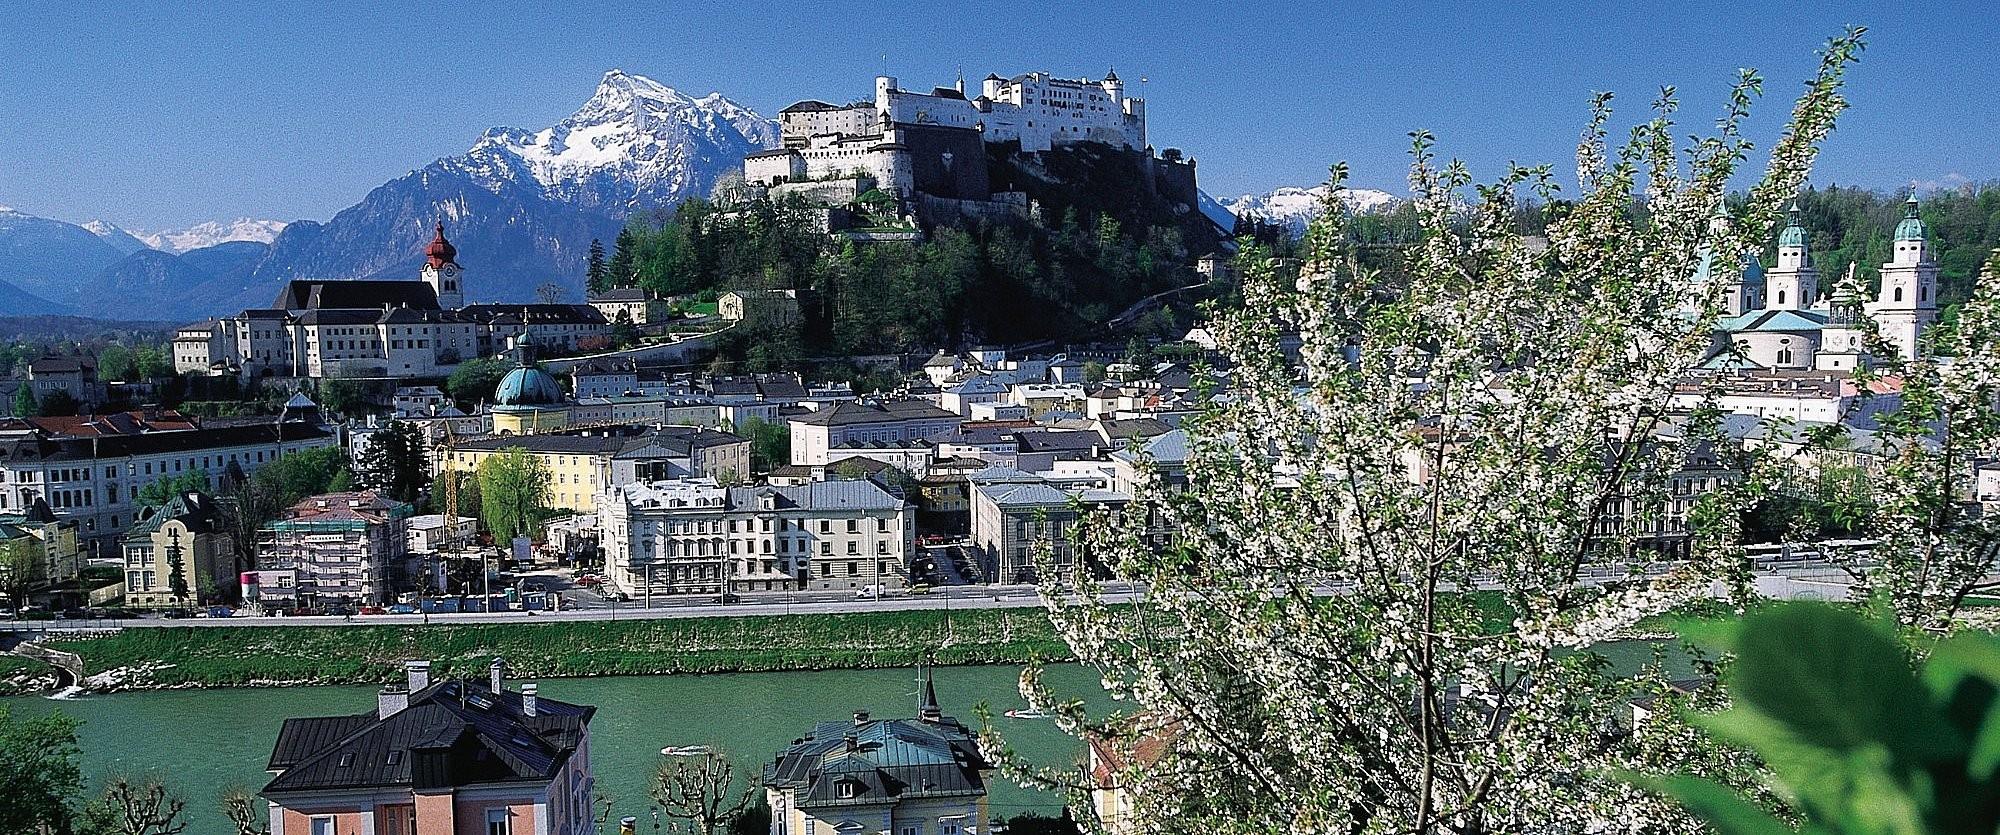 Youth hostel Salzburg.